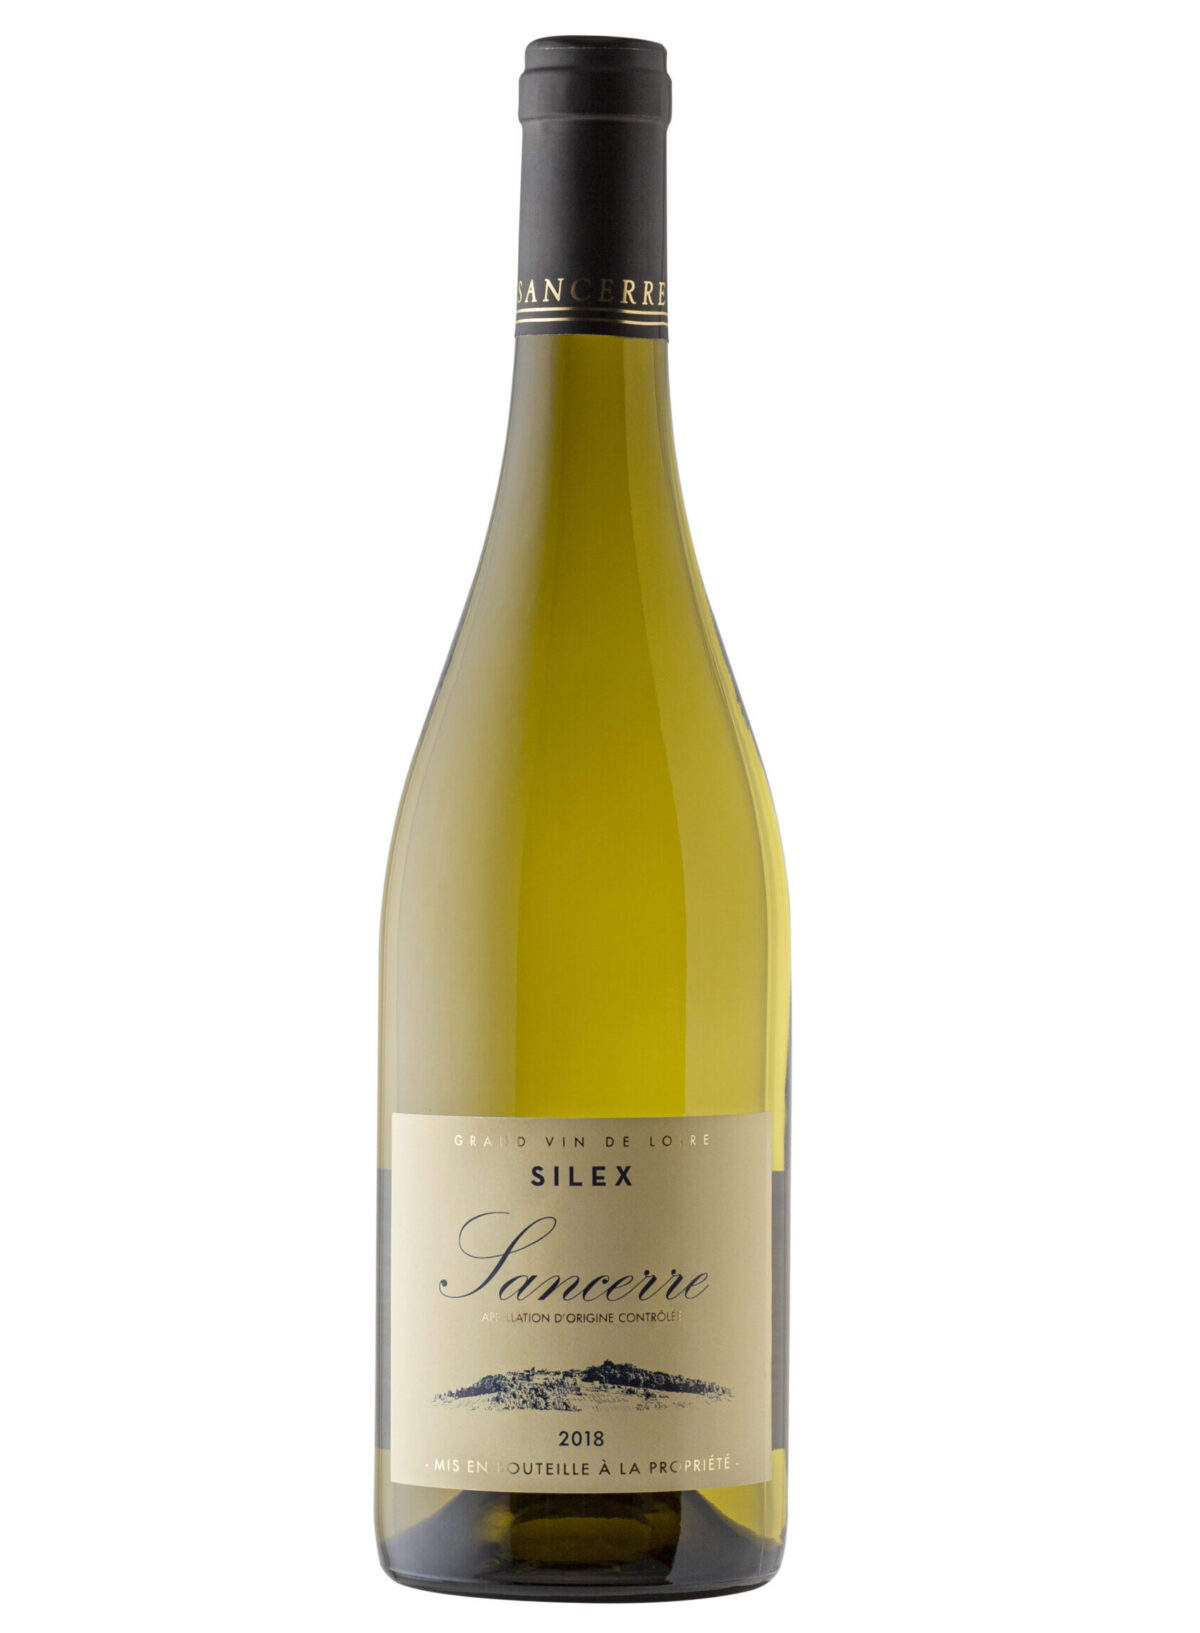 Gerard Maudry Sancerre Silex eurpoean wine bottle.